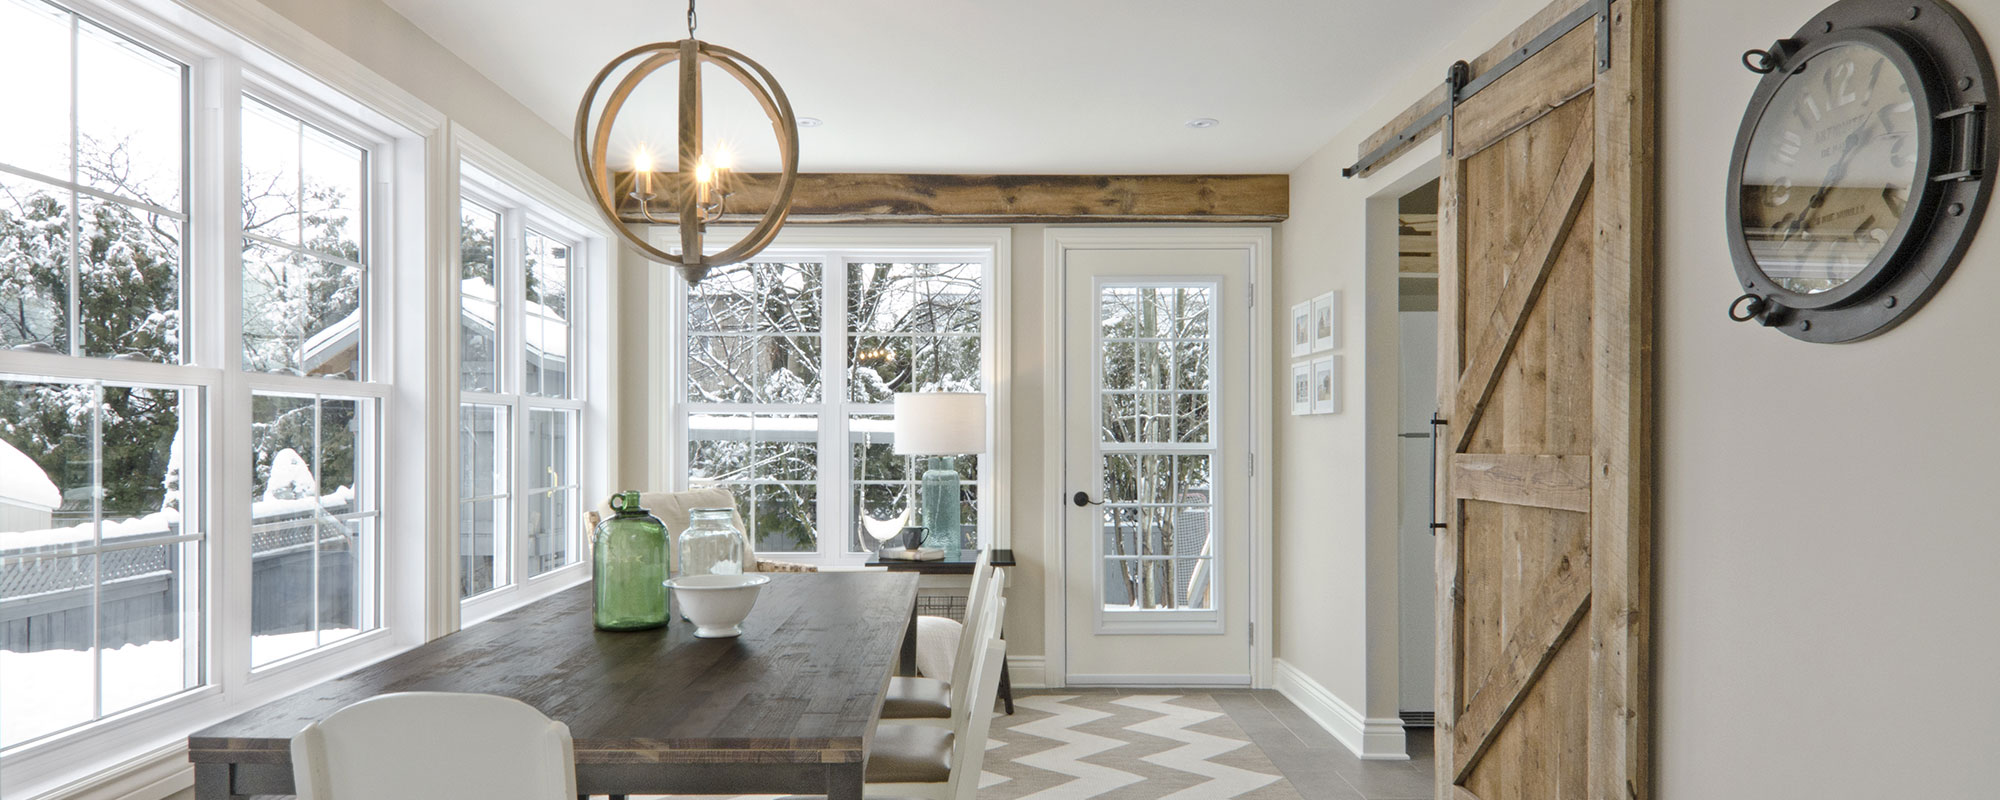 Natalie Cox Design - Award Winning Interior Decorator in Kanata / Ottawa, Ontario